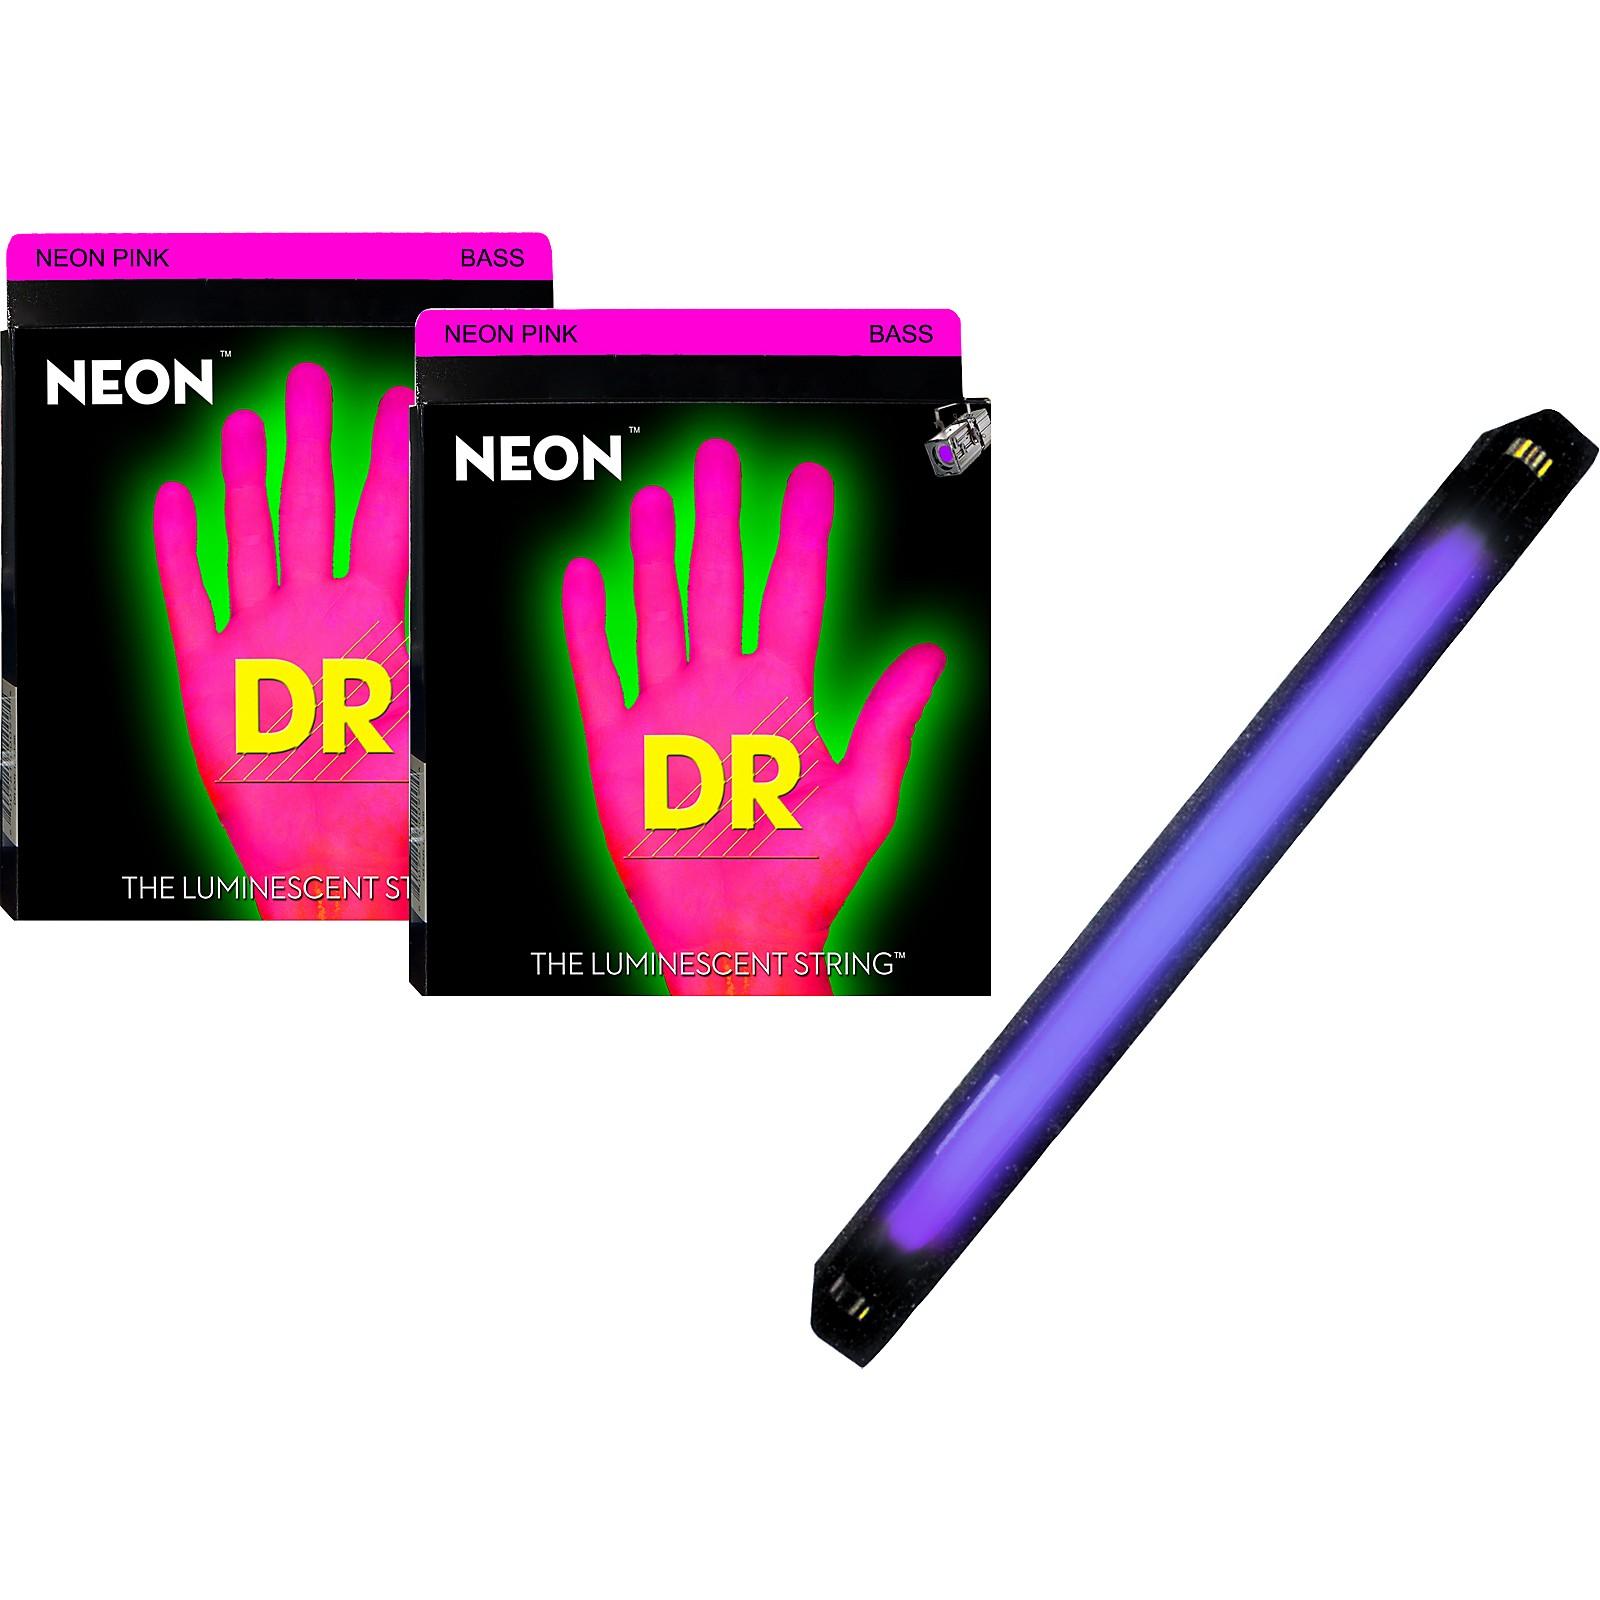 DR Strings Neon Phosphorescent Pink Medium 4 String Bass Strings with Free American DJ Super Black Light